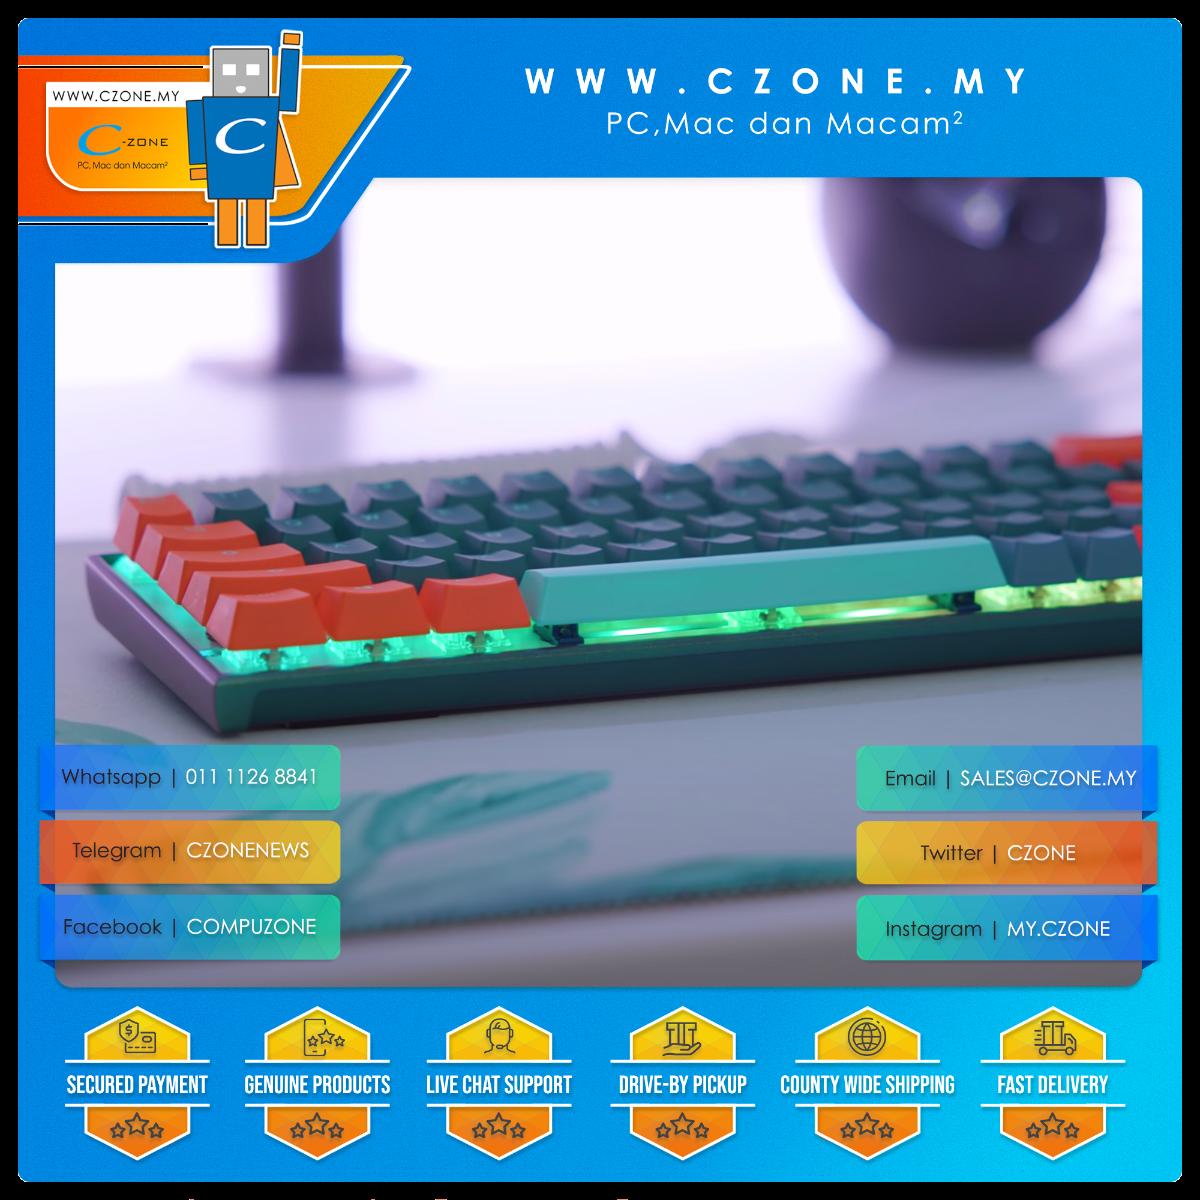 https://czone.my/czone/accessories/keyboards.html?brand=5574